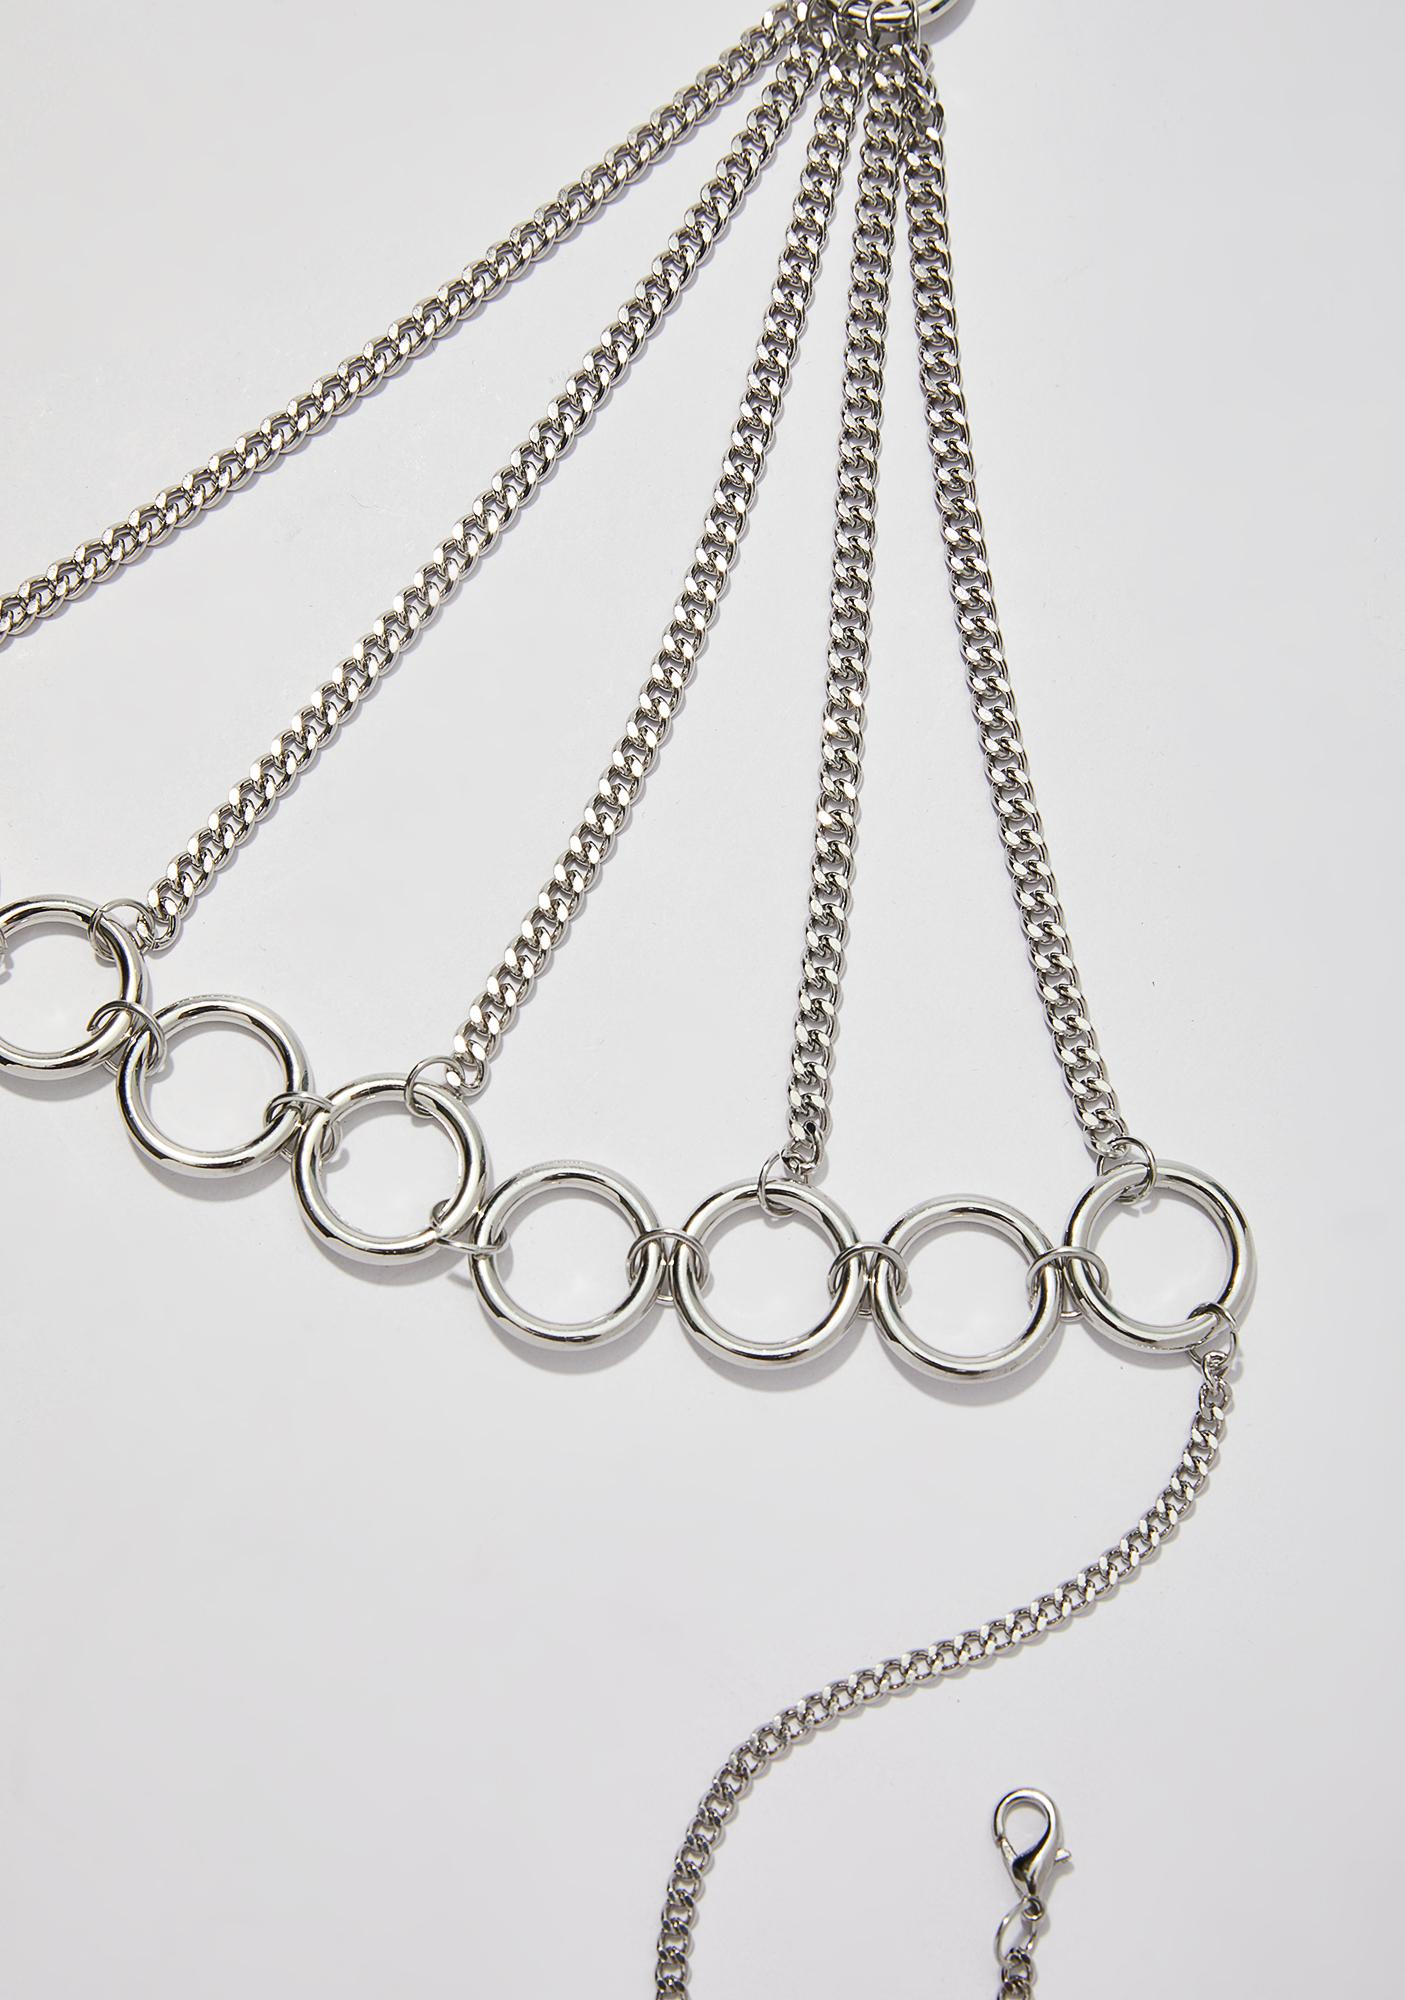 Strongest Link Chain Bralette